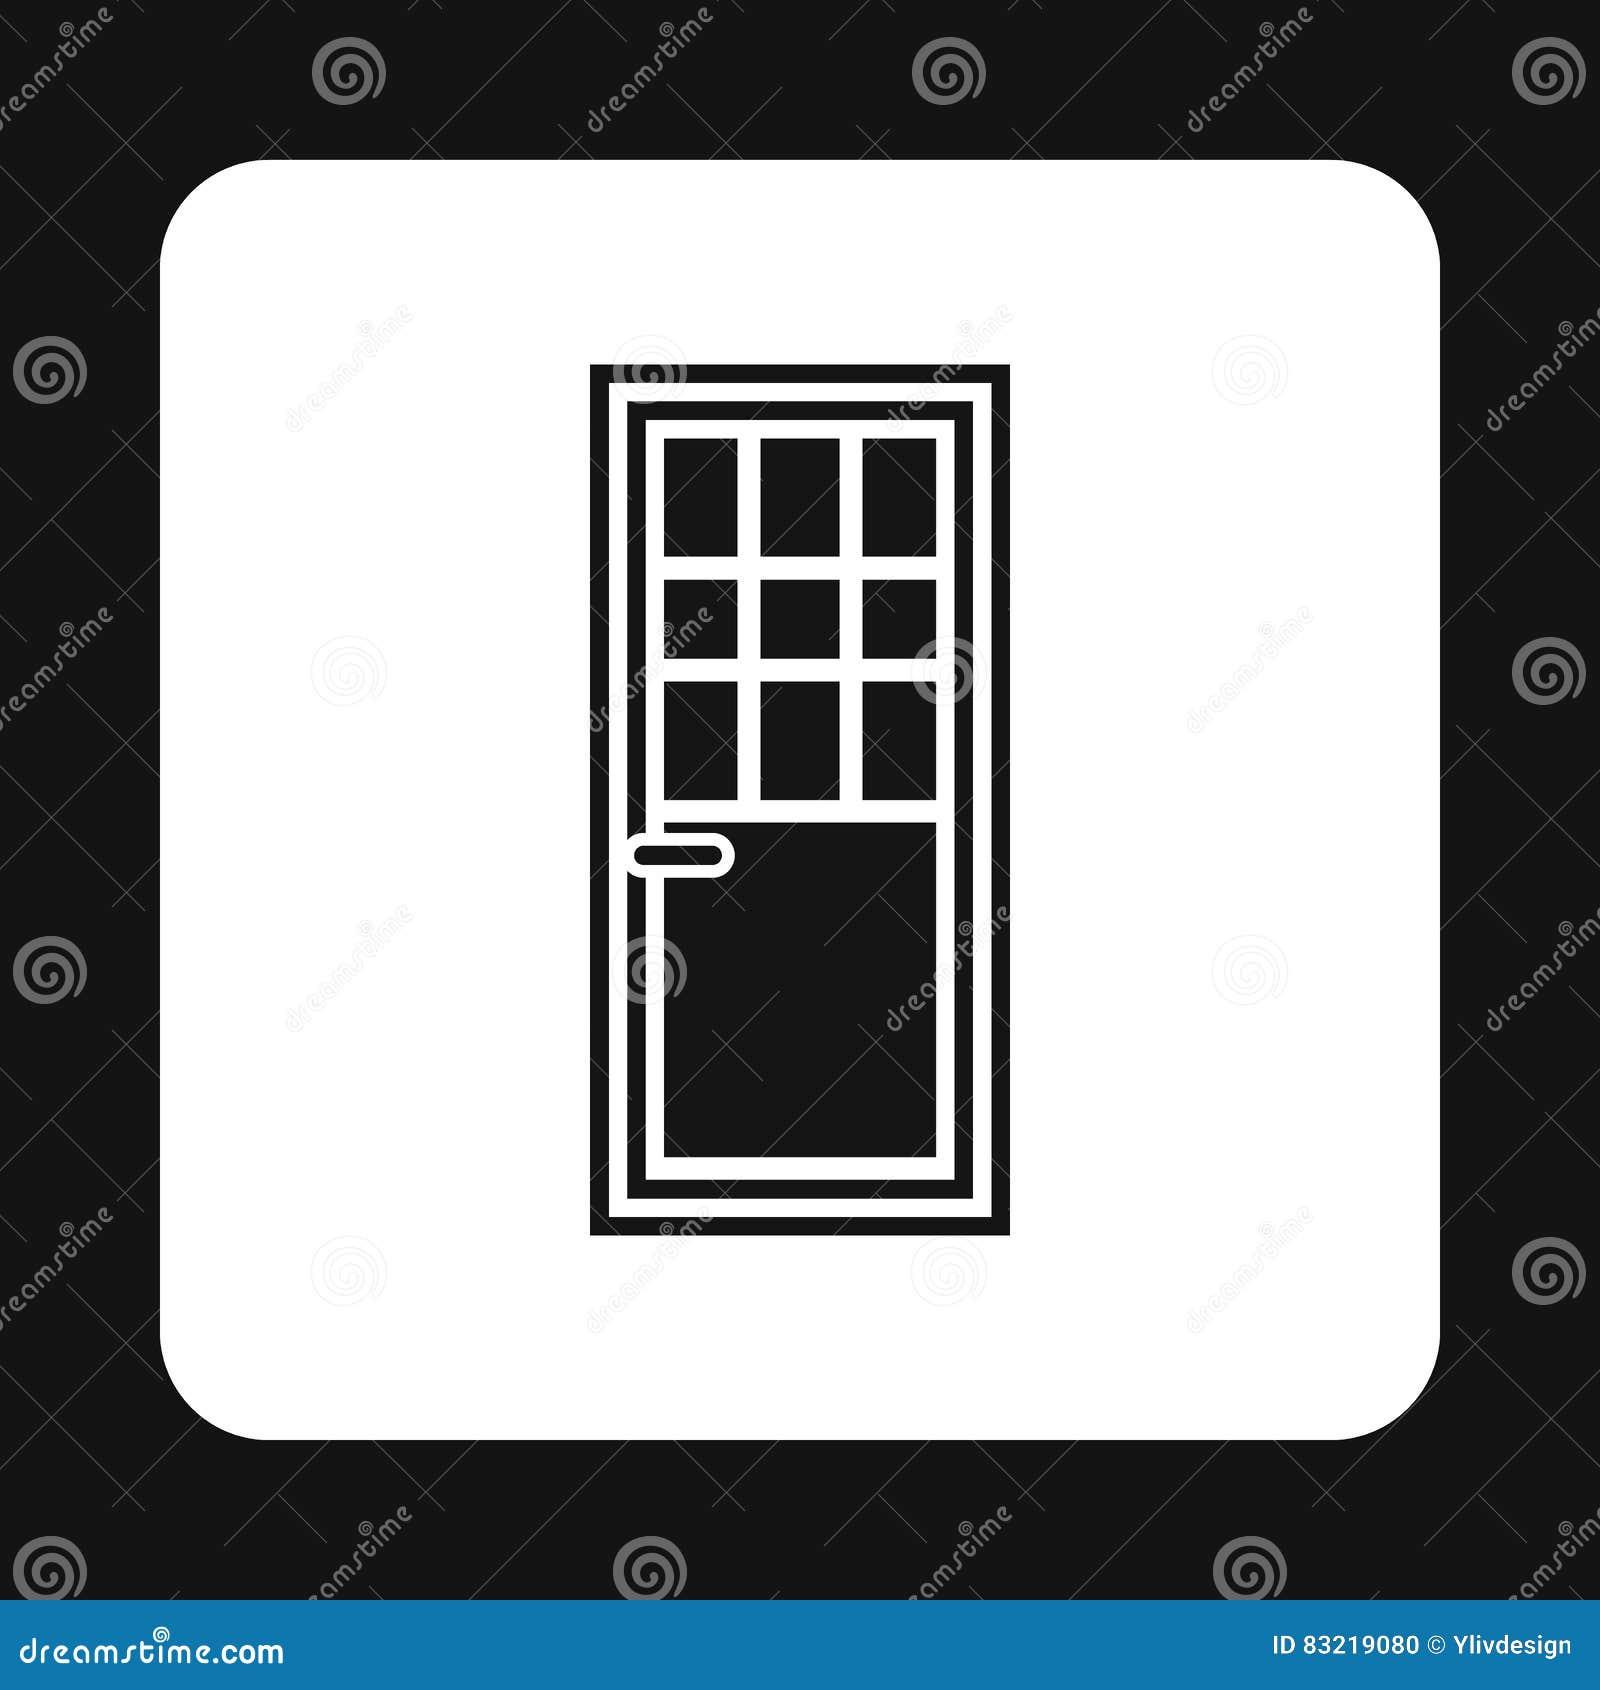 Living room door icon simple style stock vector illustration of living room door icon simple style buycottarizona Gallery